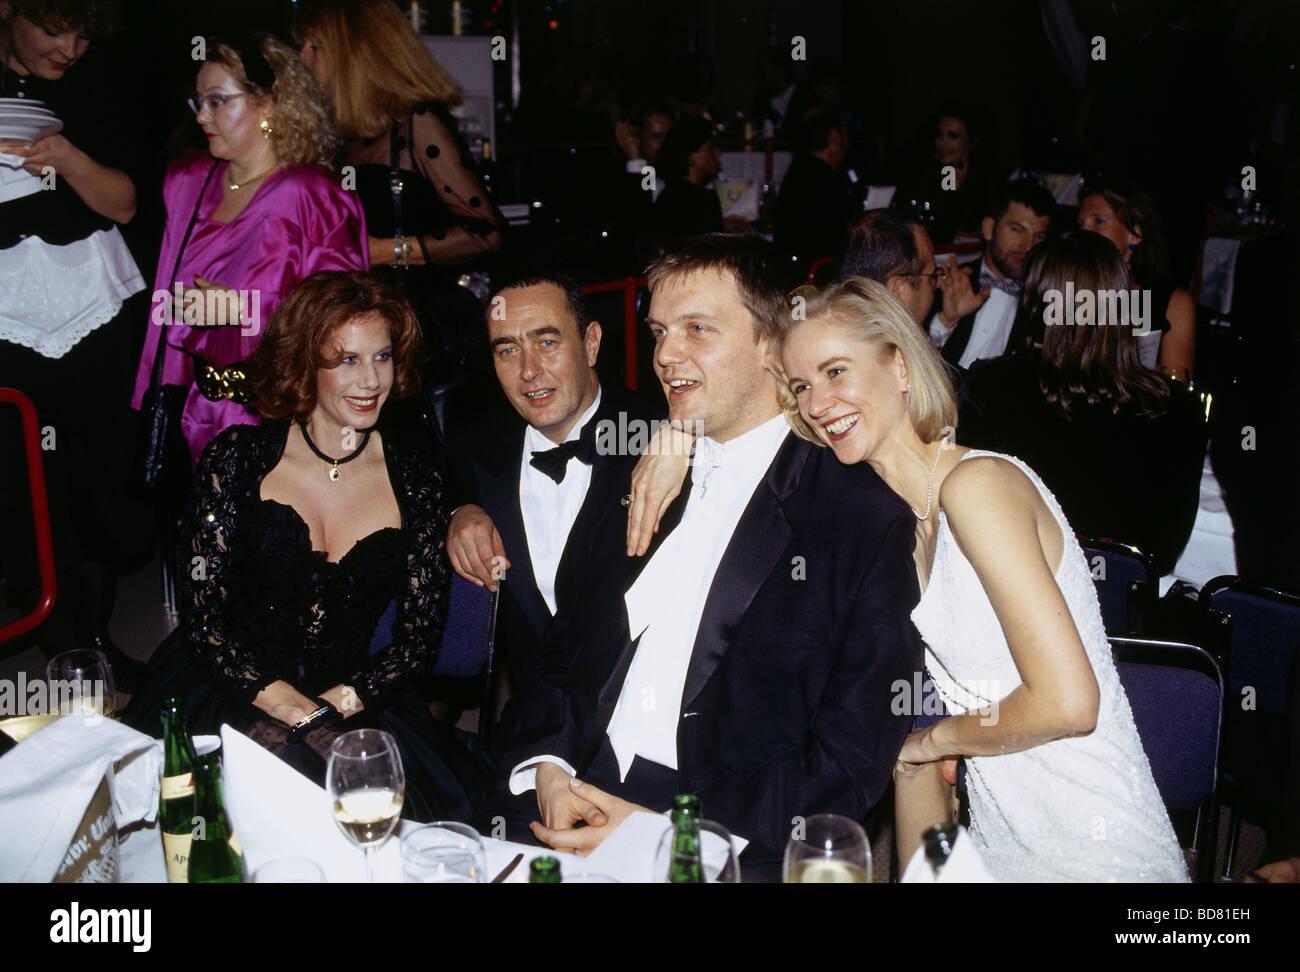 Kerkeling, Hans Peter 'Hape', * 9.12.1964, german actor, comedian, half length, with Penny Mc Lean, Bernd - Stock Image